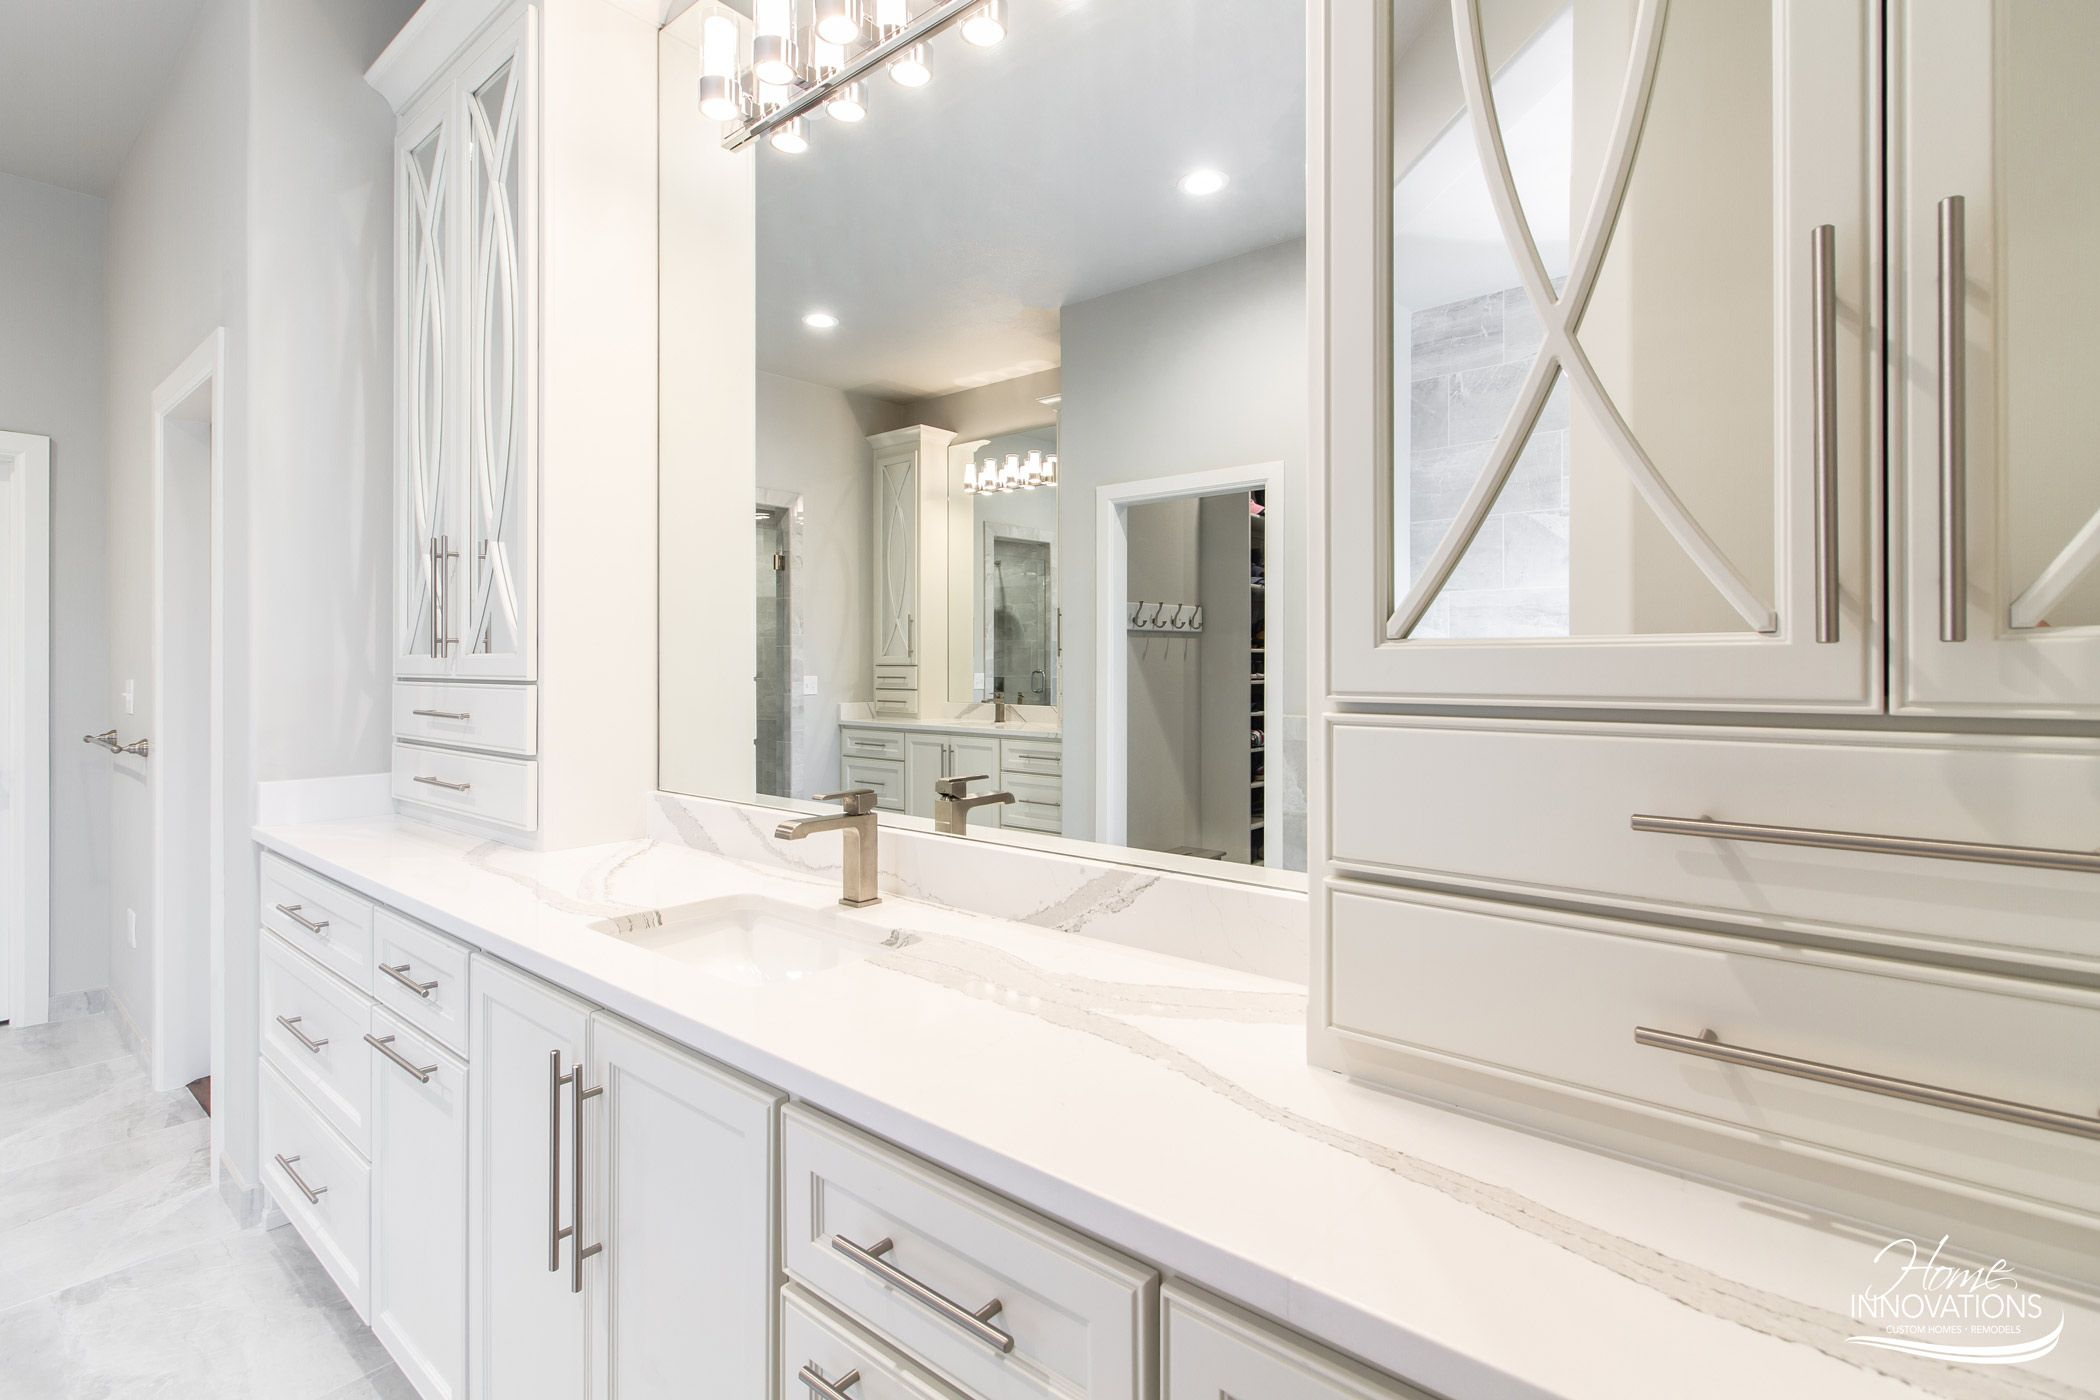 Master Bathroom Remodel Tulsa Ok White Cabinets Tile Floor